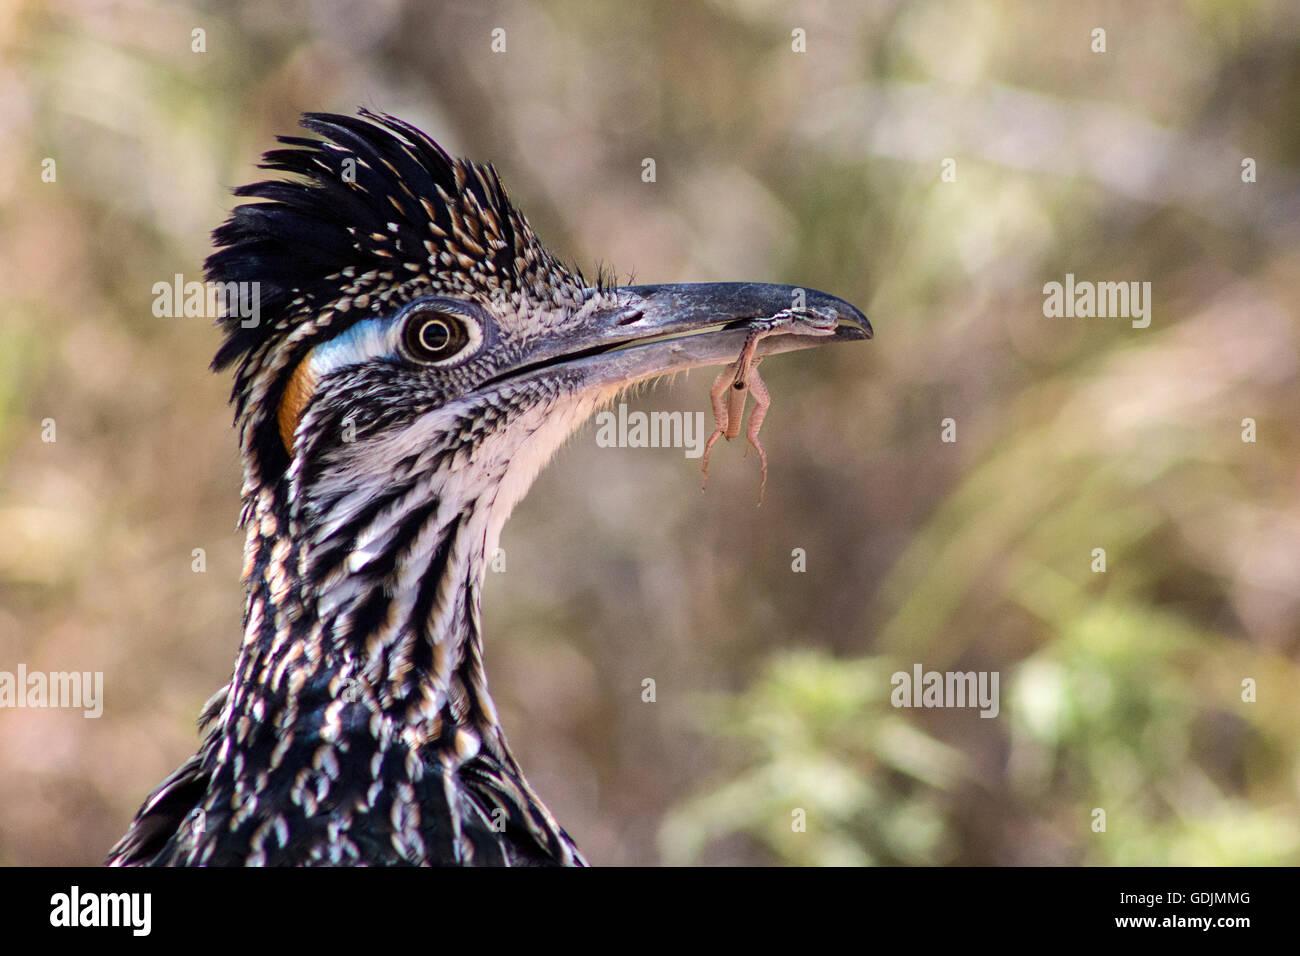 Greater Roadrunner (Geococcyx californianus) - Santa Clara Ranch, McCook, Texas, USA - Stock Image